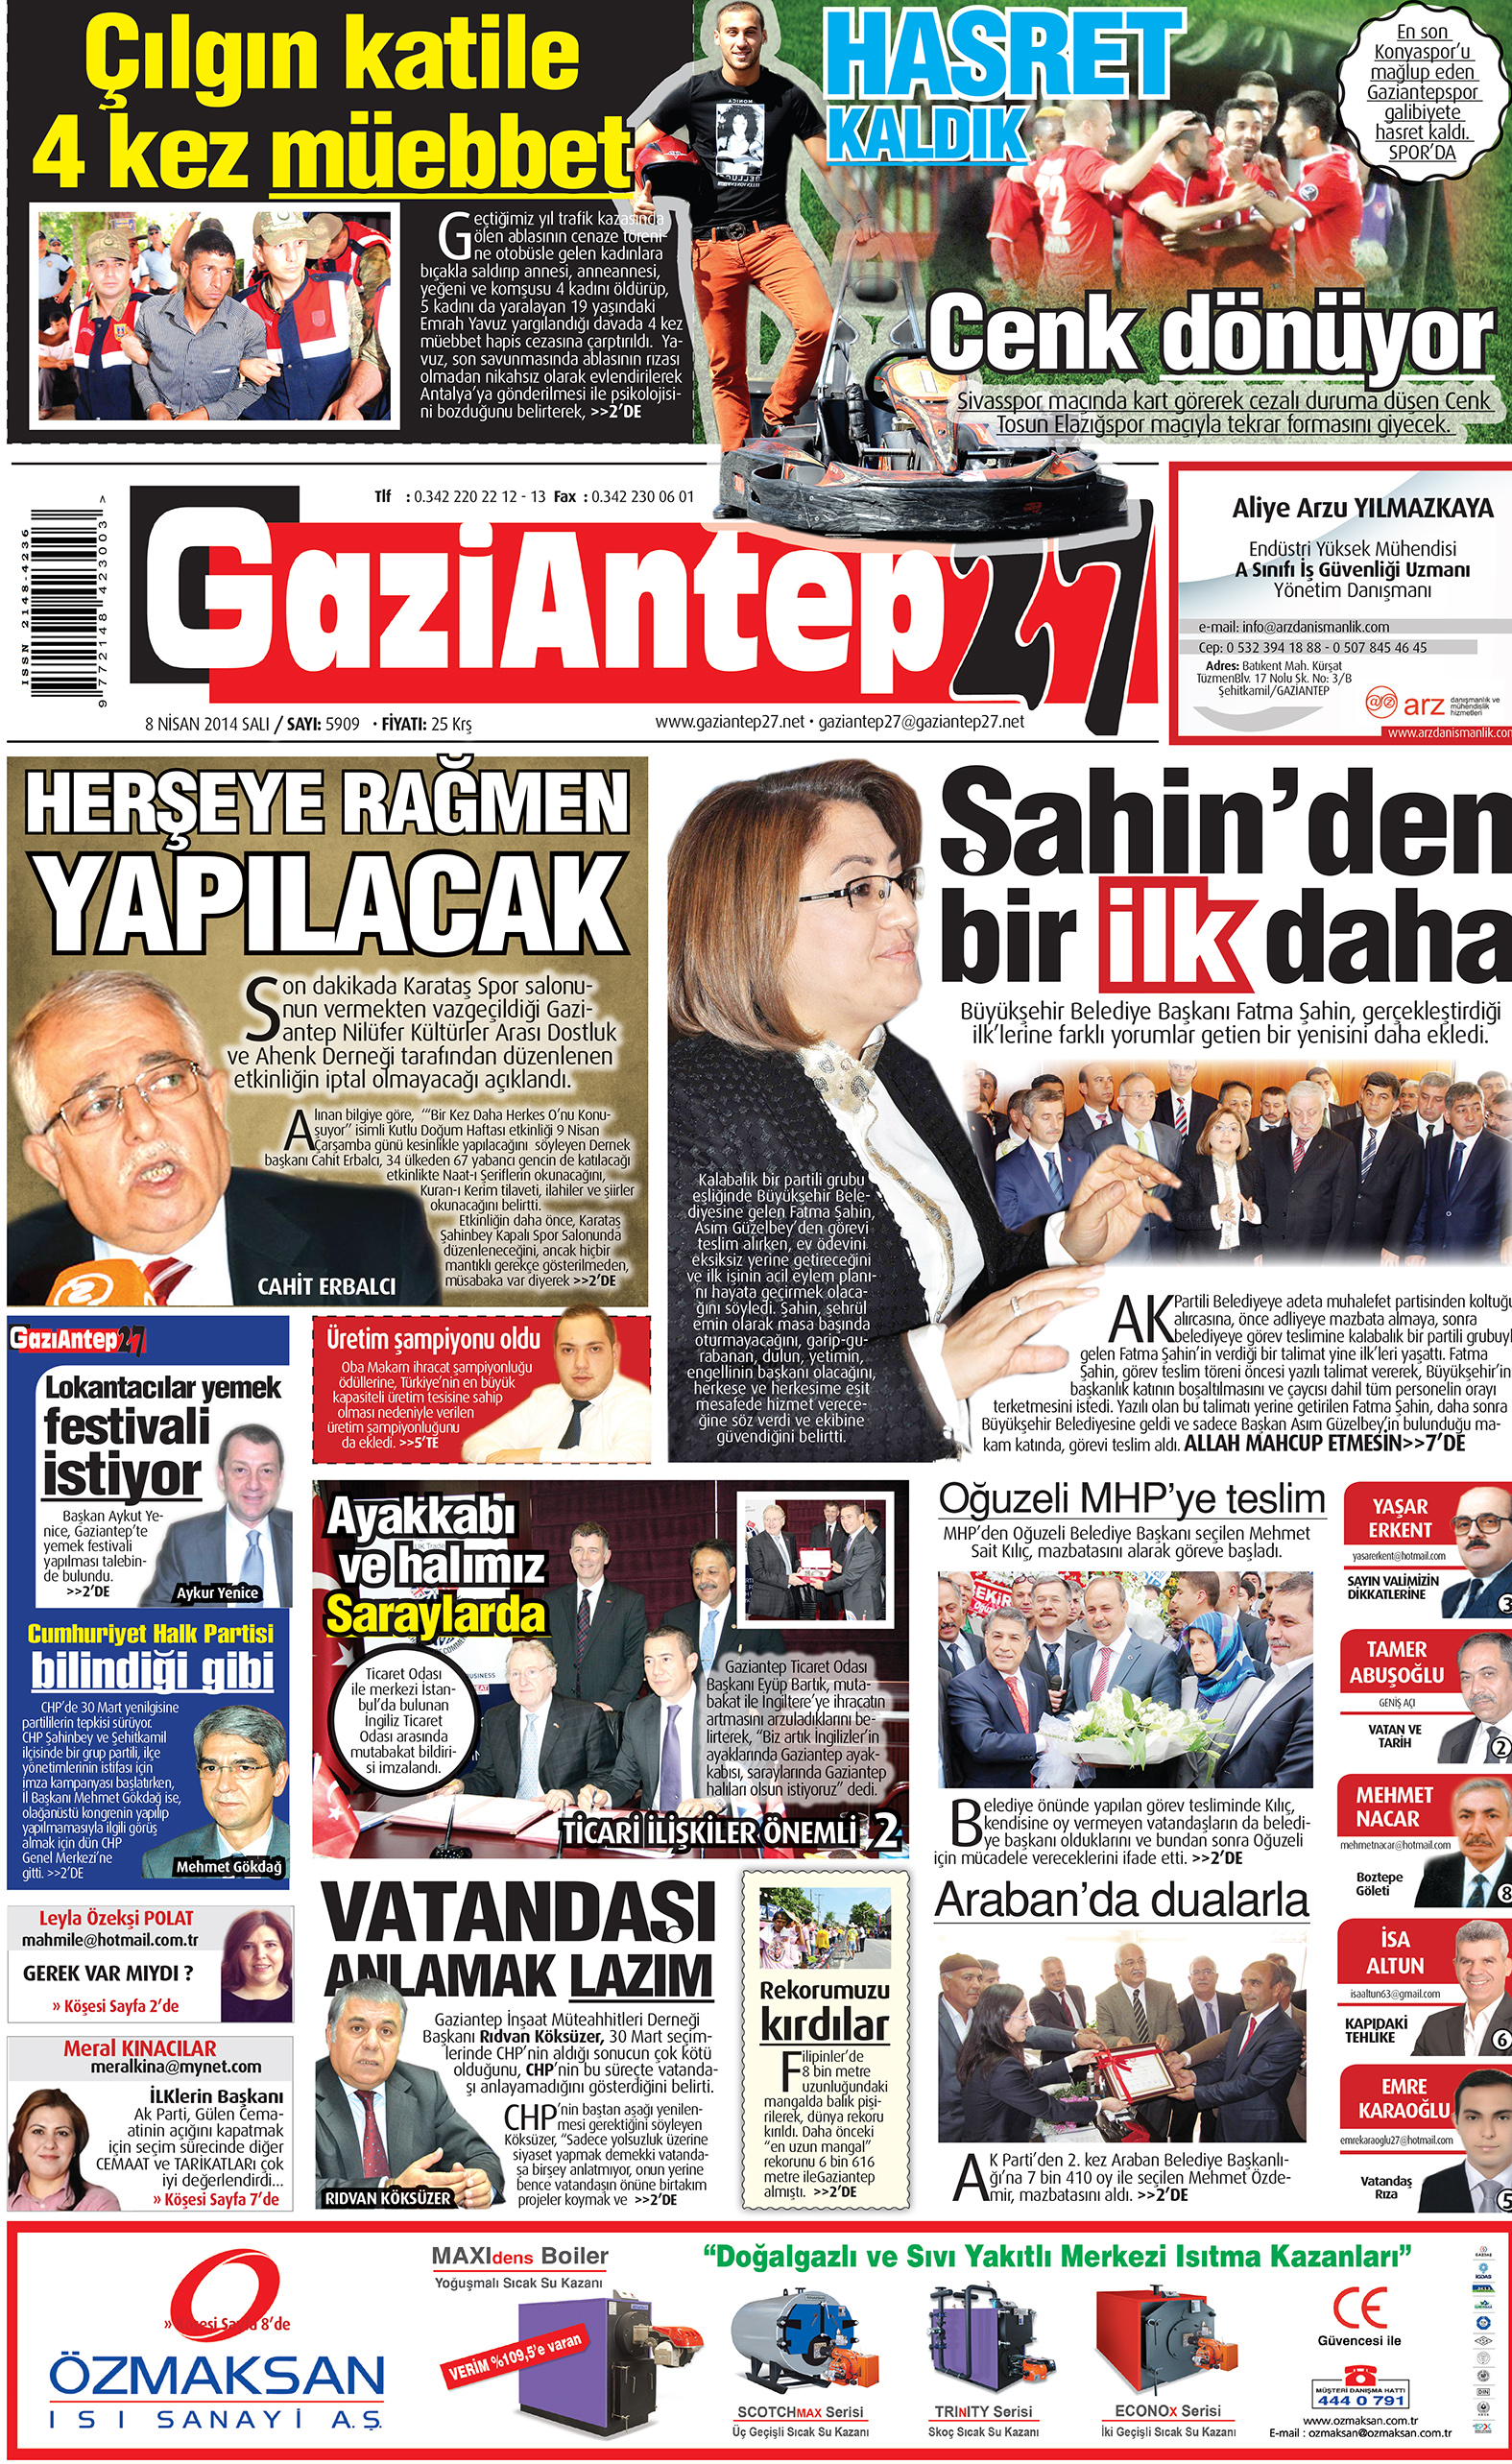 8 Nisan 2014 sayfalar 1